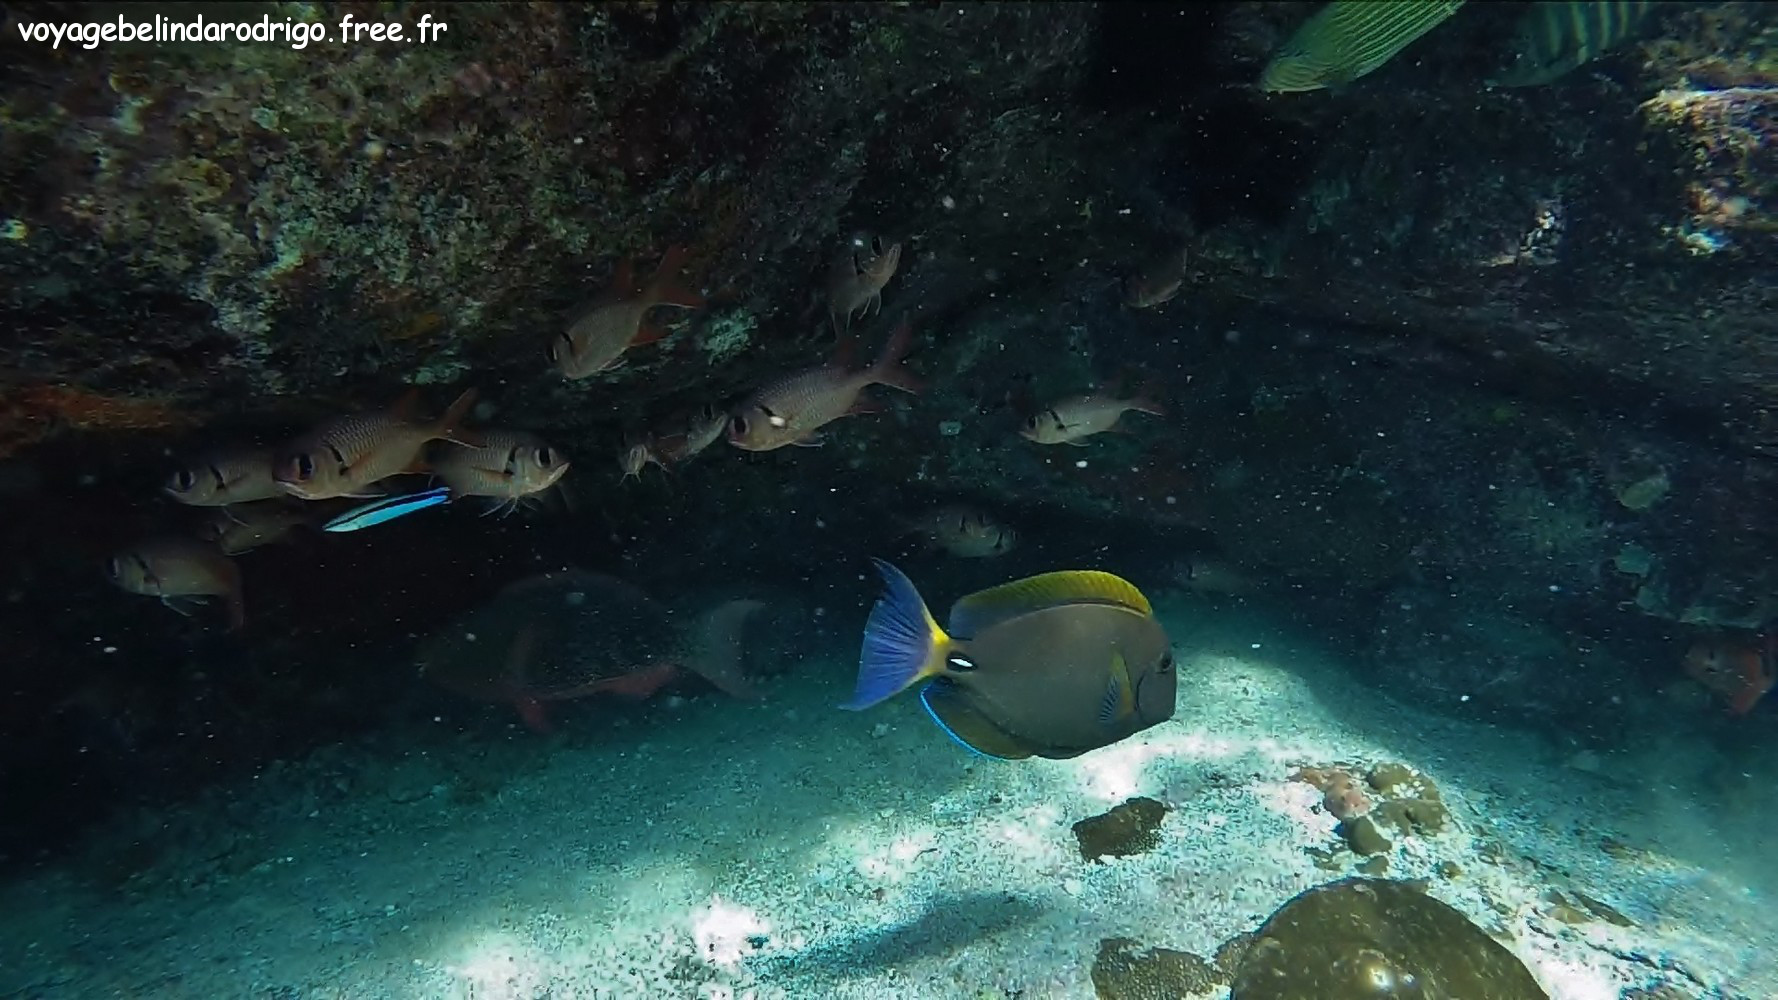 Poisson Chirurgien à oeil rayé - Snorkeling - Îlot St Pierre - Praslin